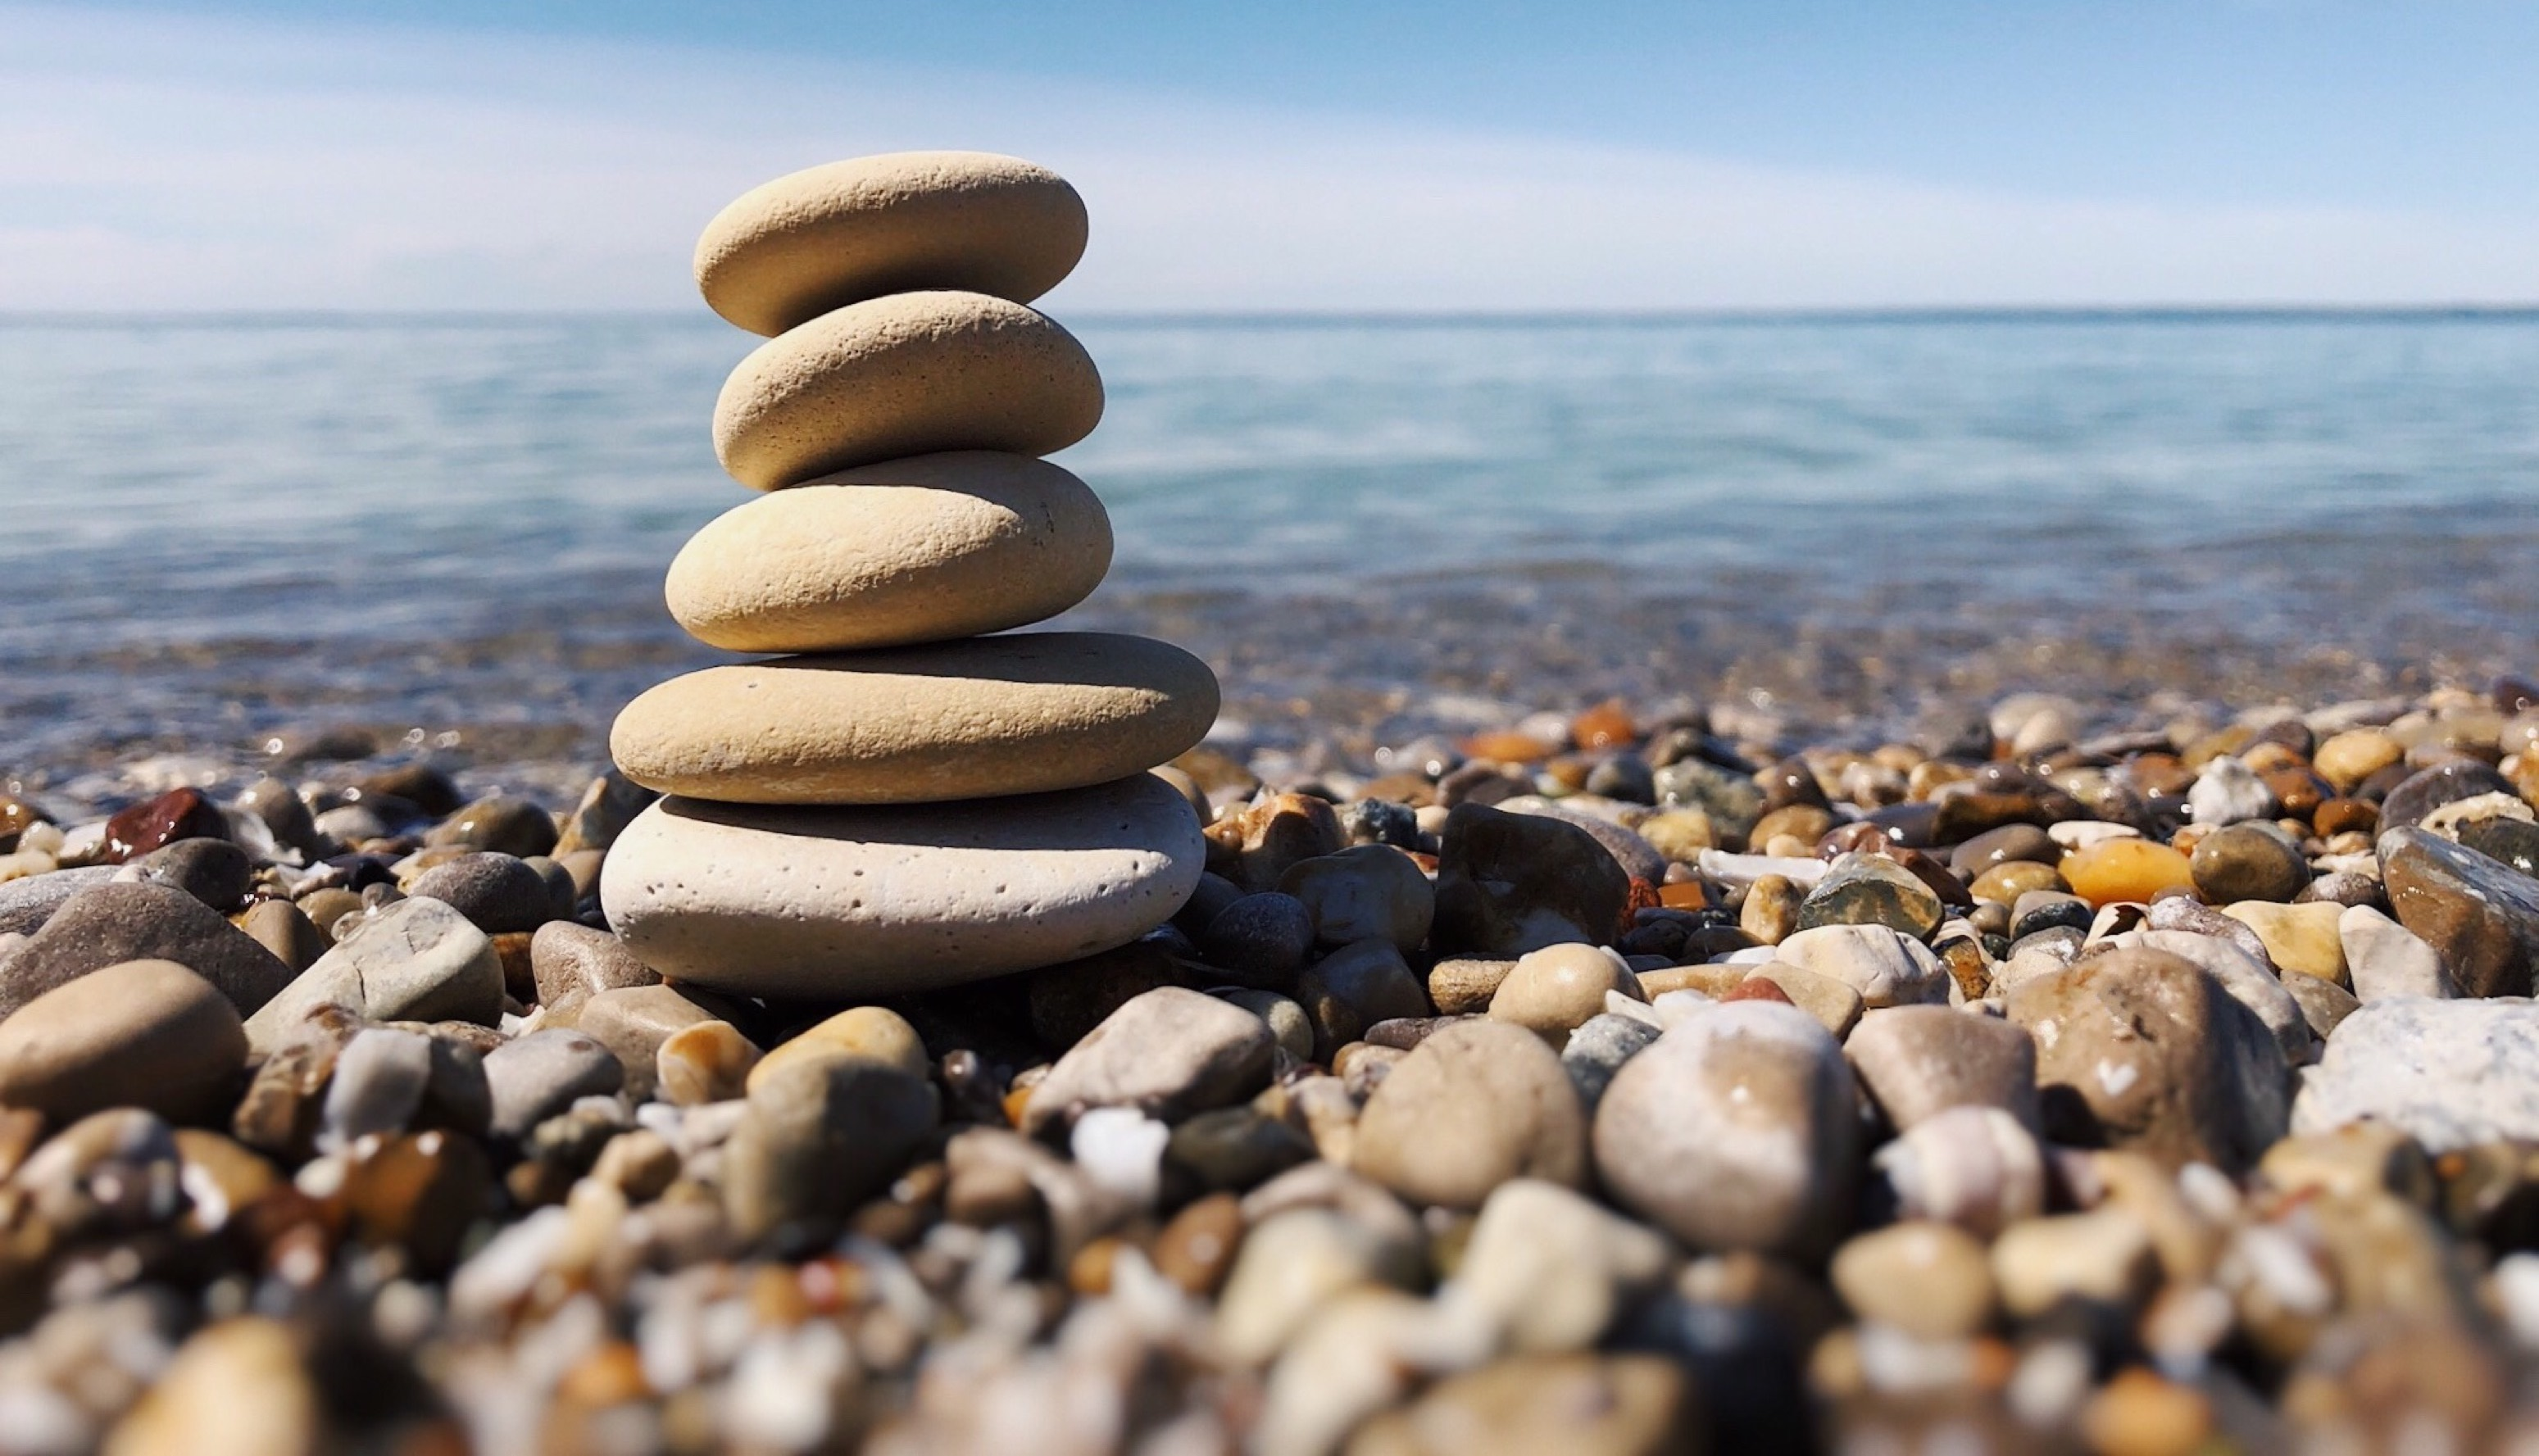 rock-balance-3428292